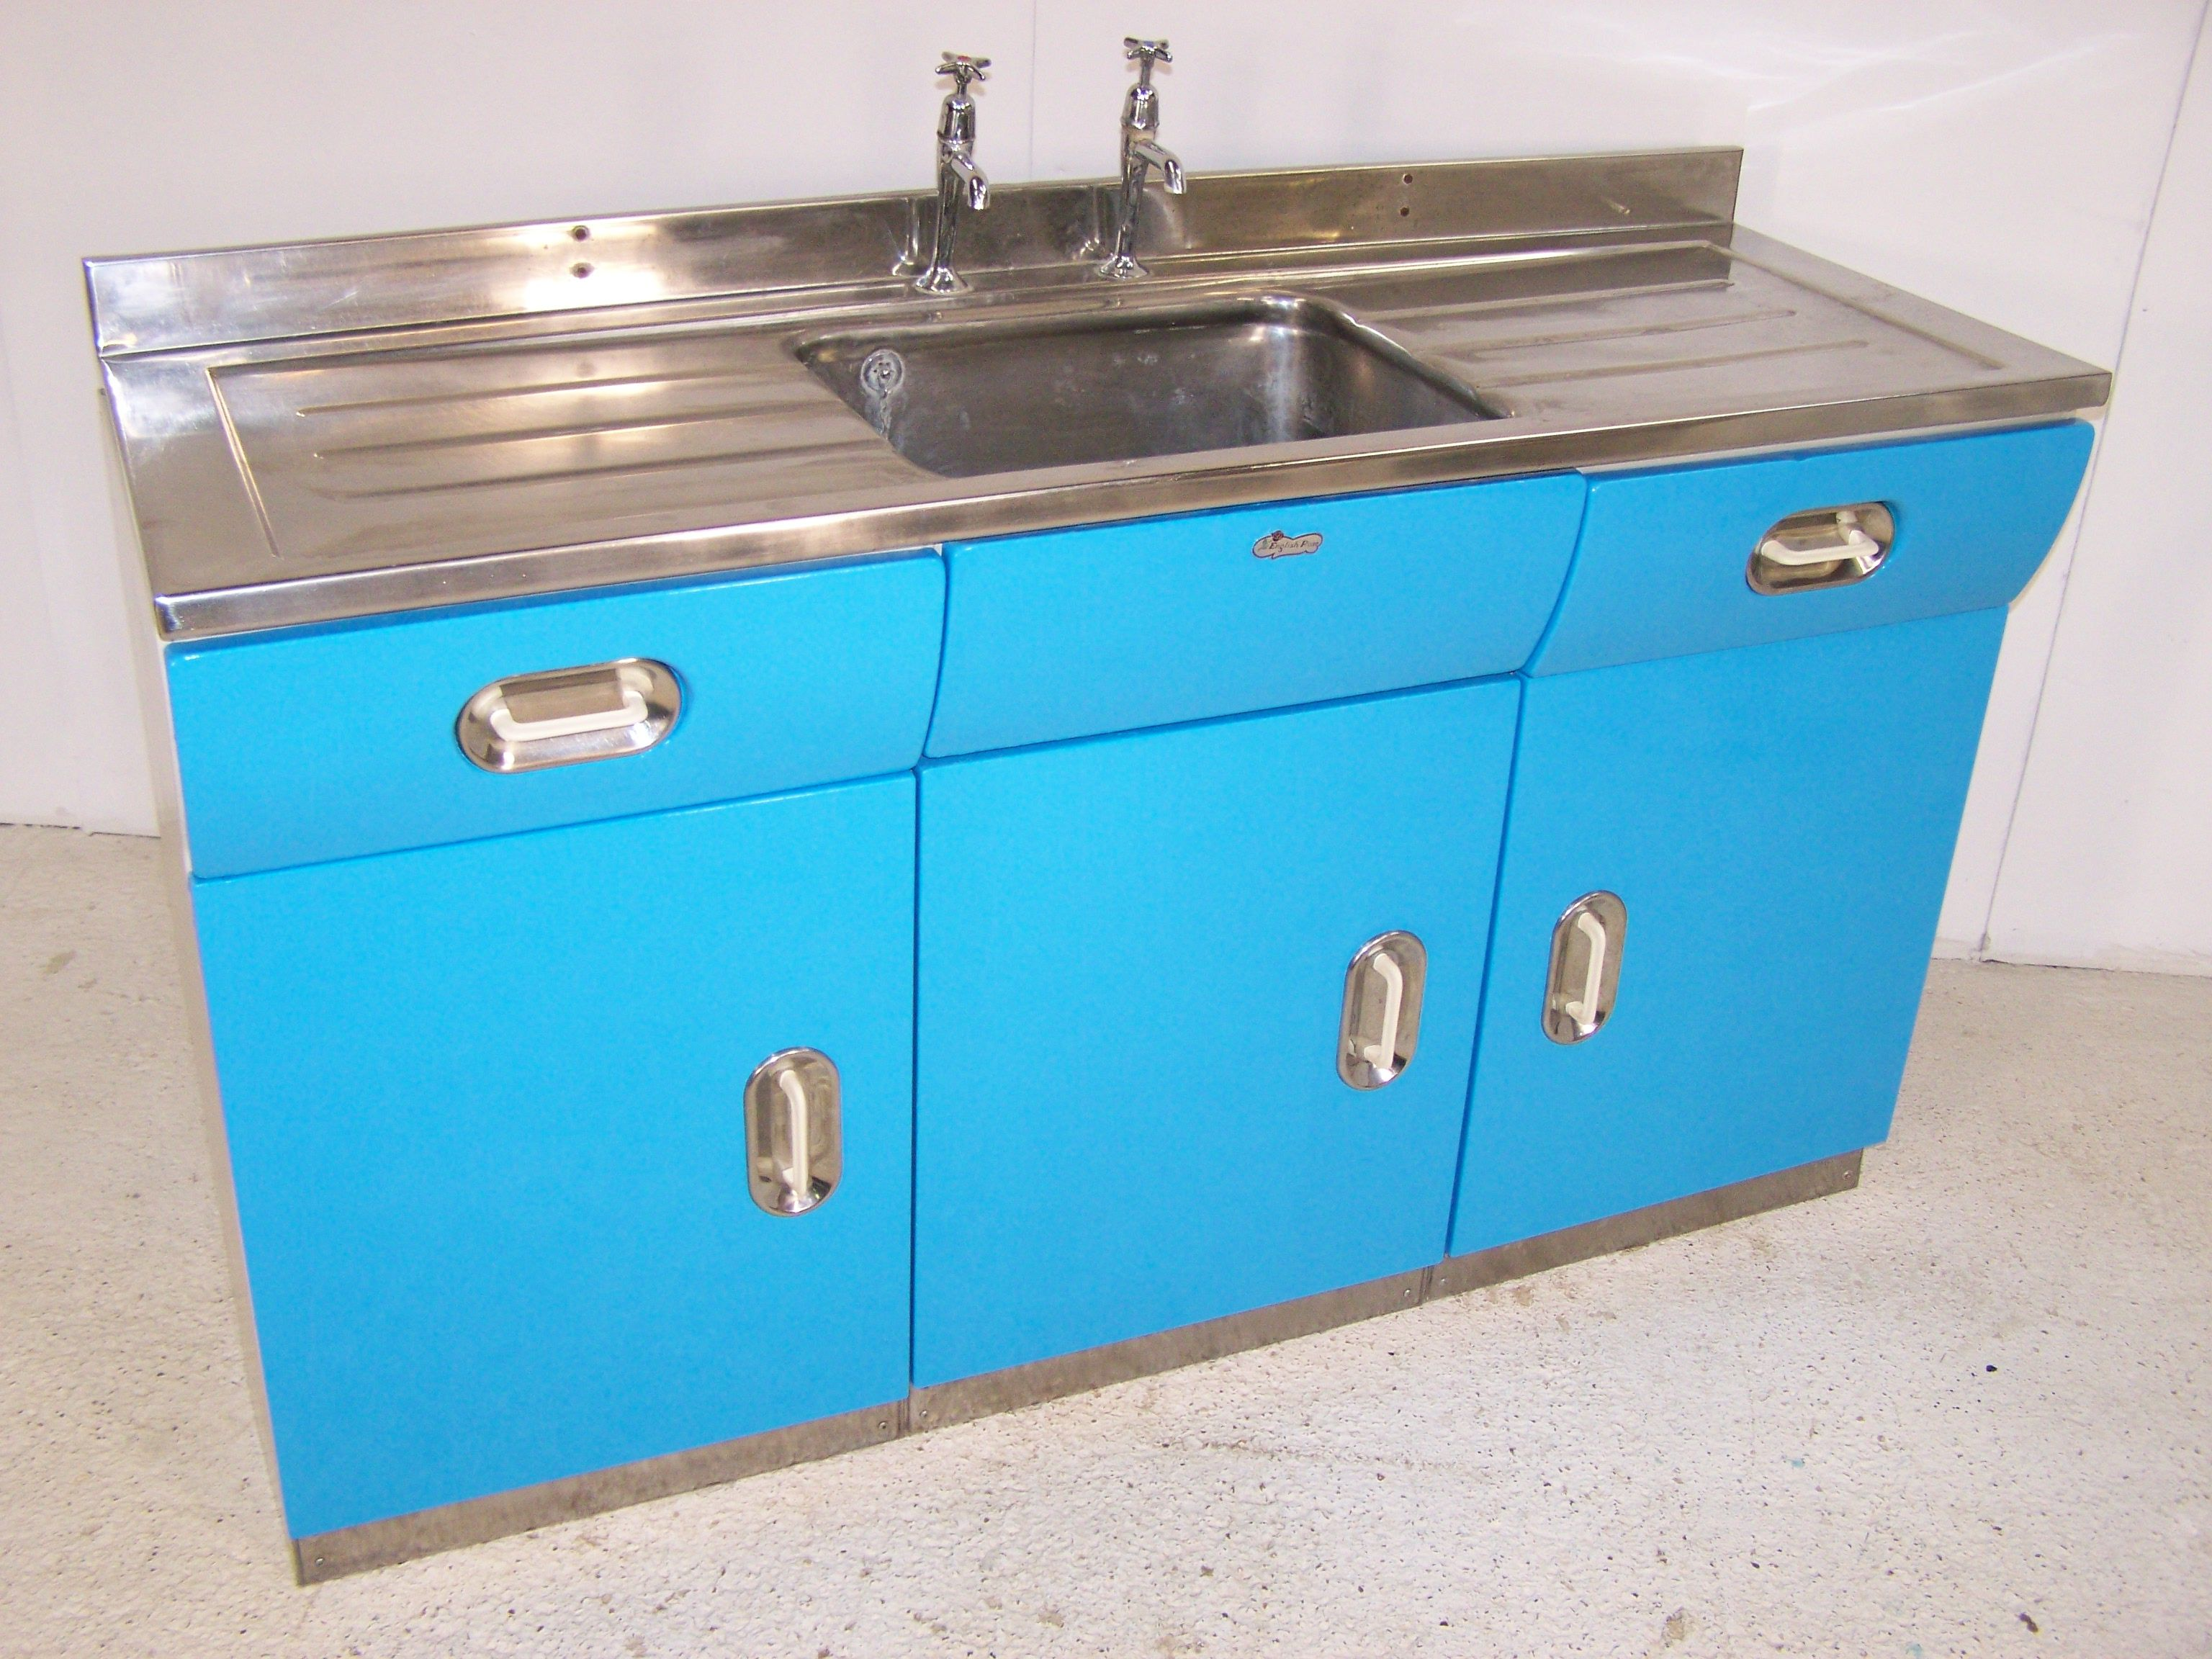 Best Kitchen Gallery: English Rose Kitchen Sink Double Wall Unit 1950's Sinks of Metal Kitchen Sink Cabinet Unit on rachelxblog.com